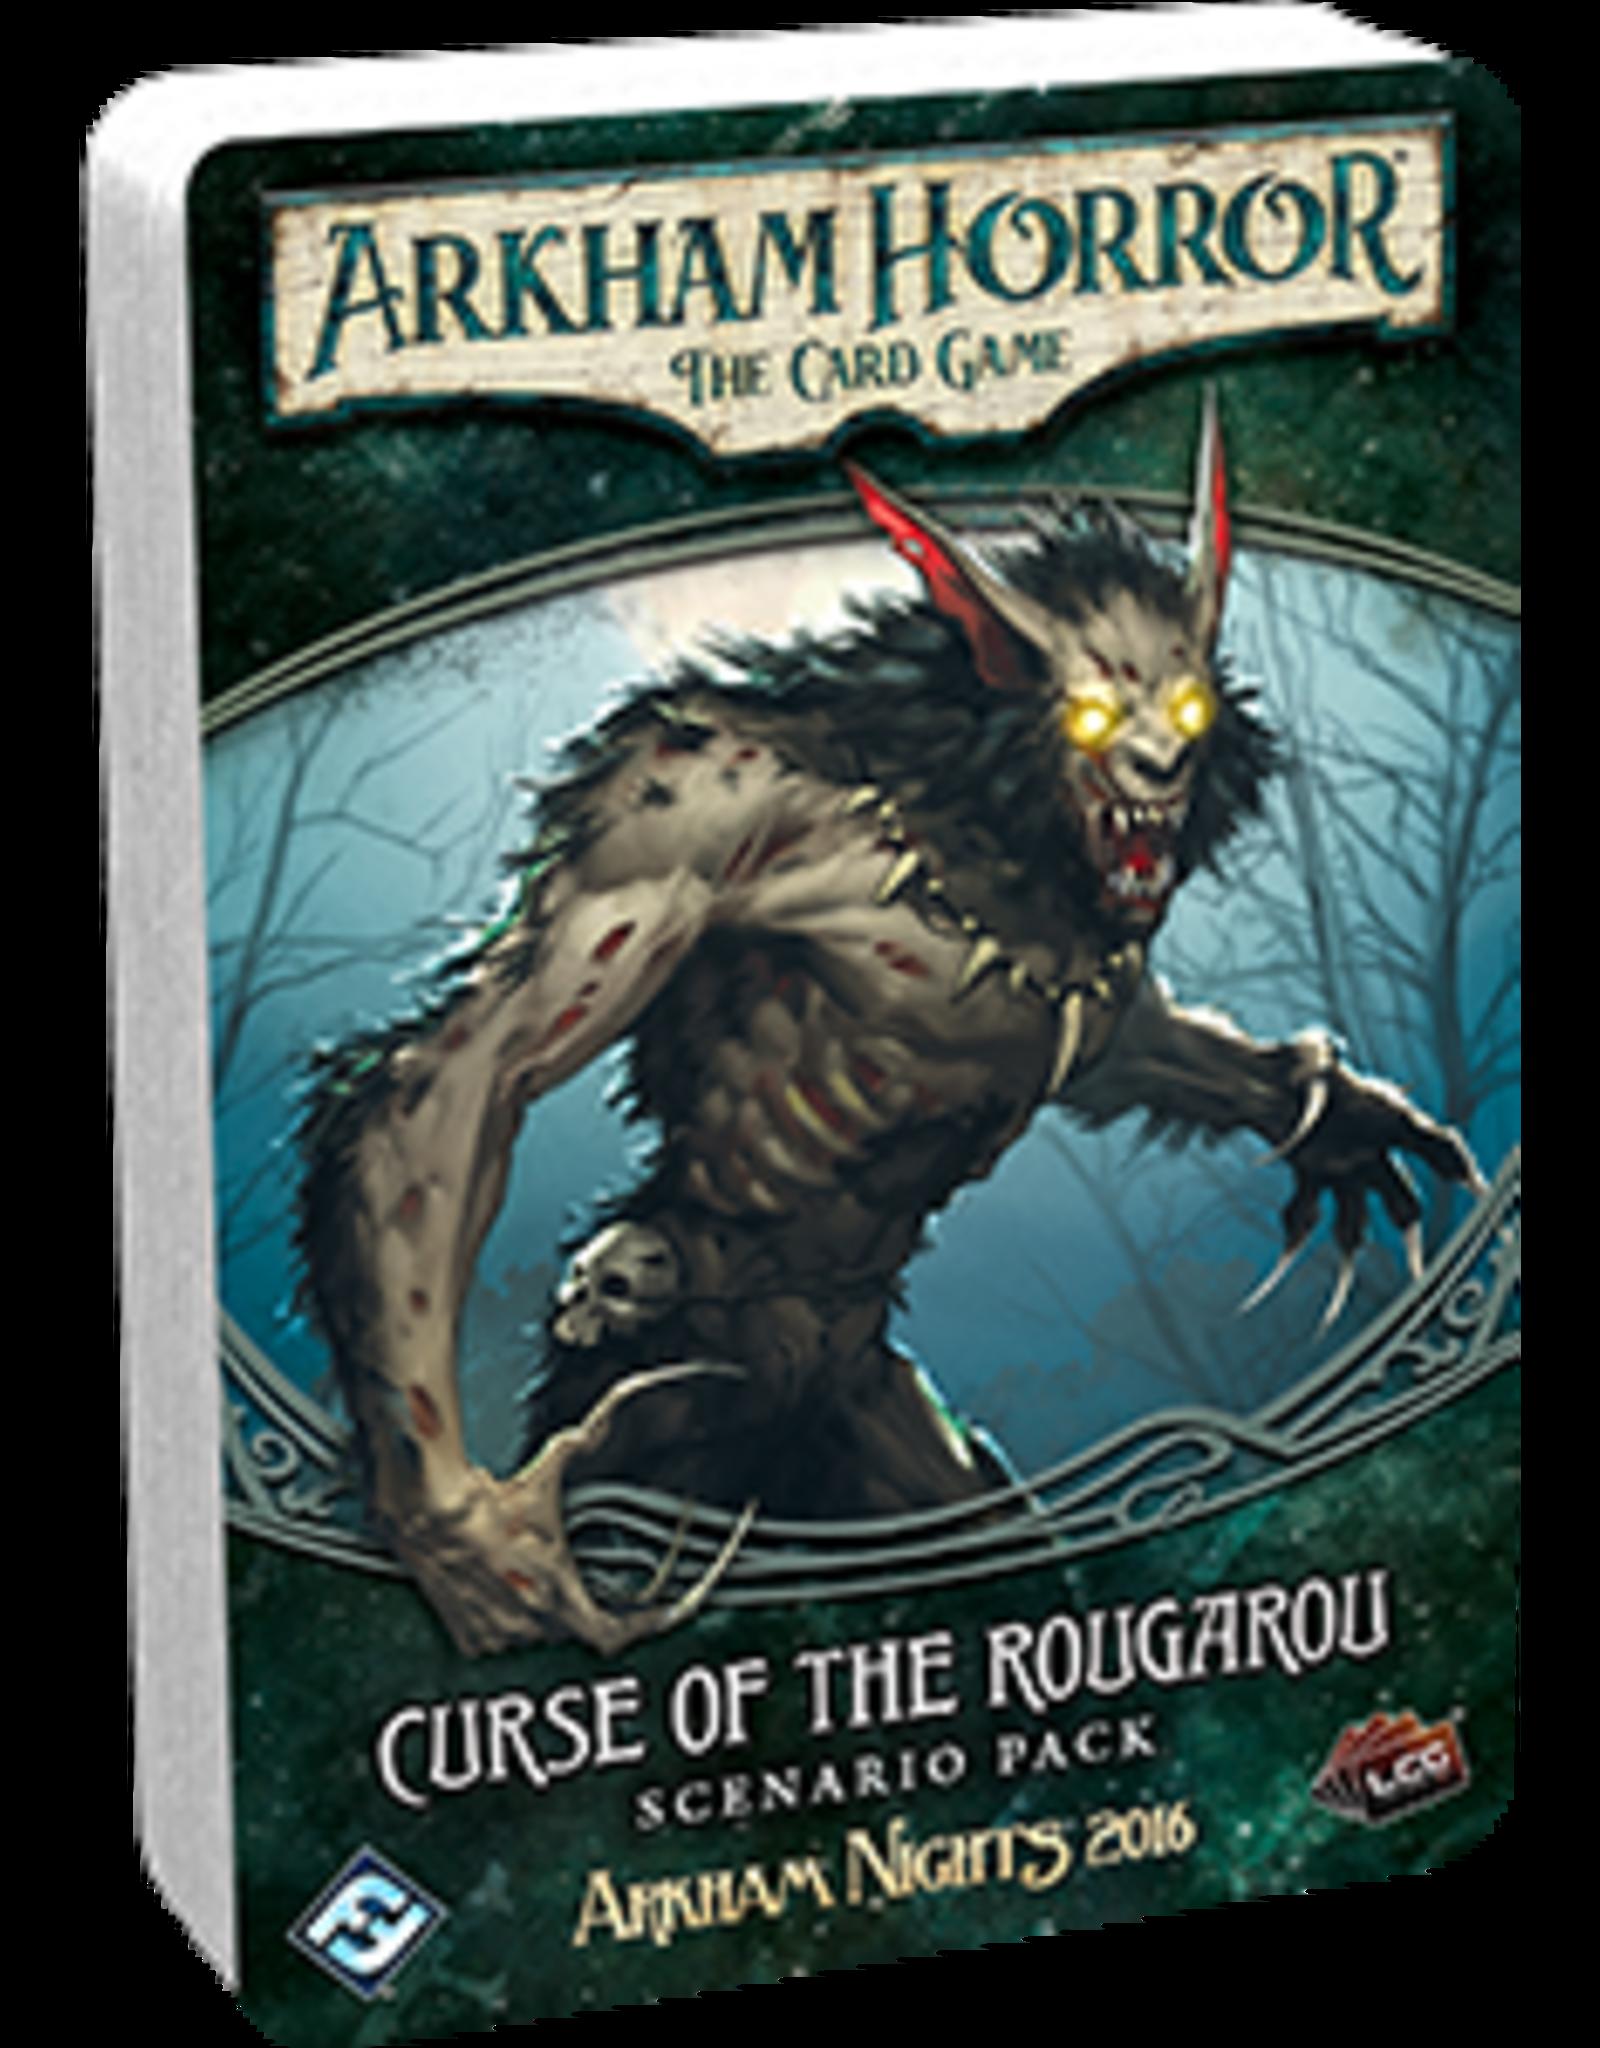 Fantasy Flight Arkham Horror LCG Curse of the Rougarou Scenario Pack